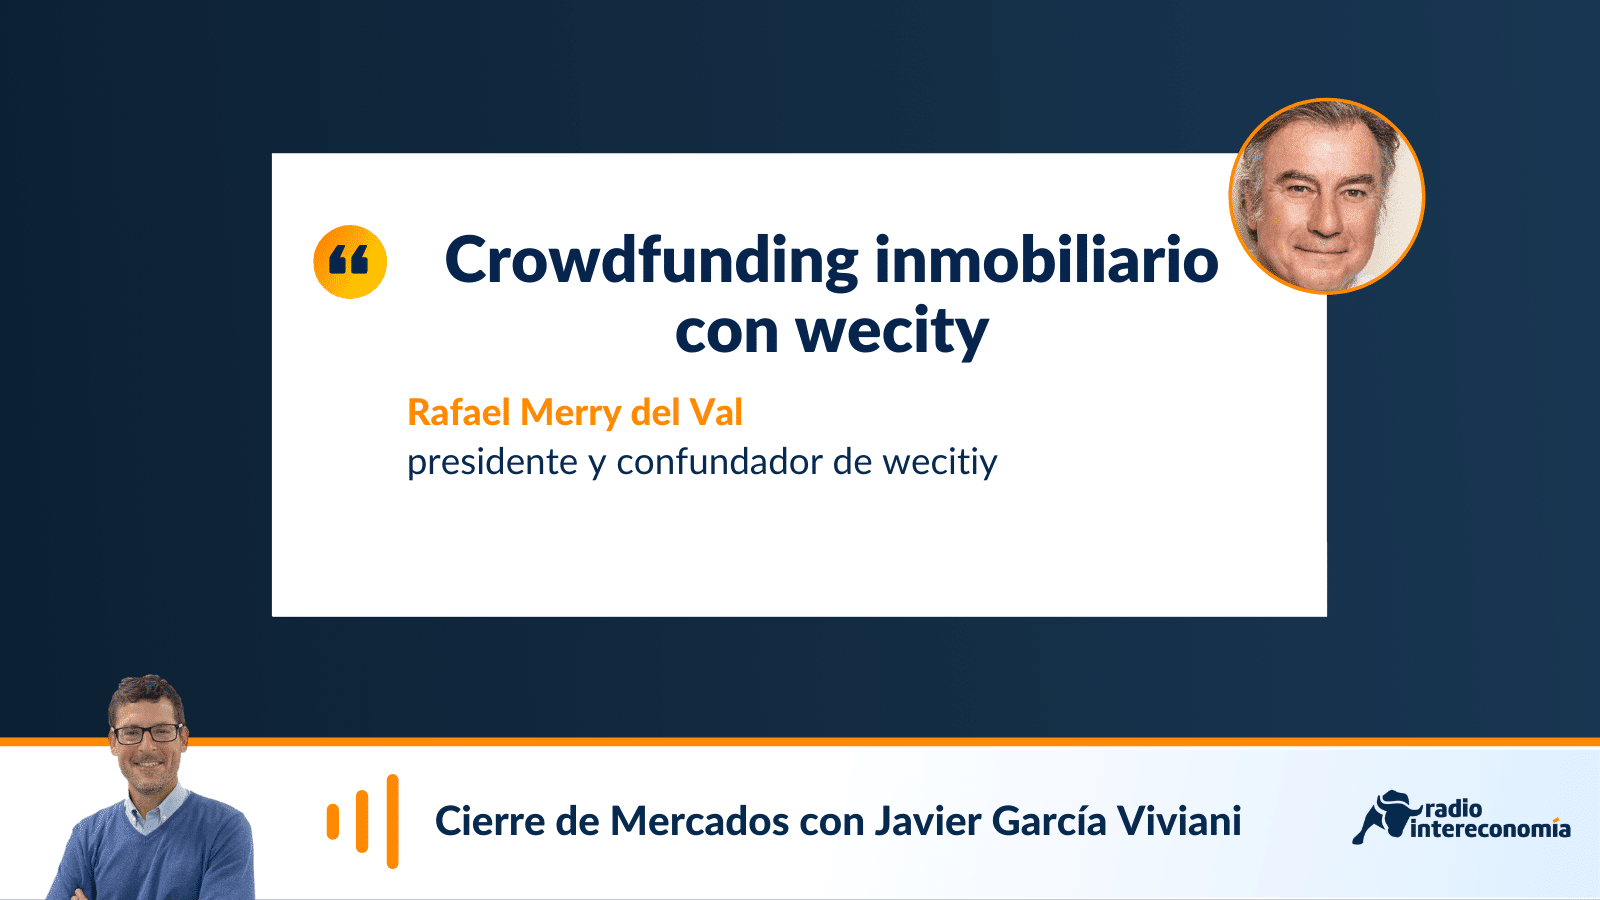 Crowdfunding inmobiliario con wecity